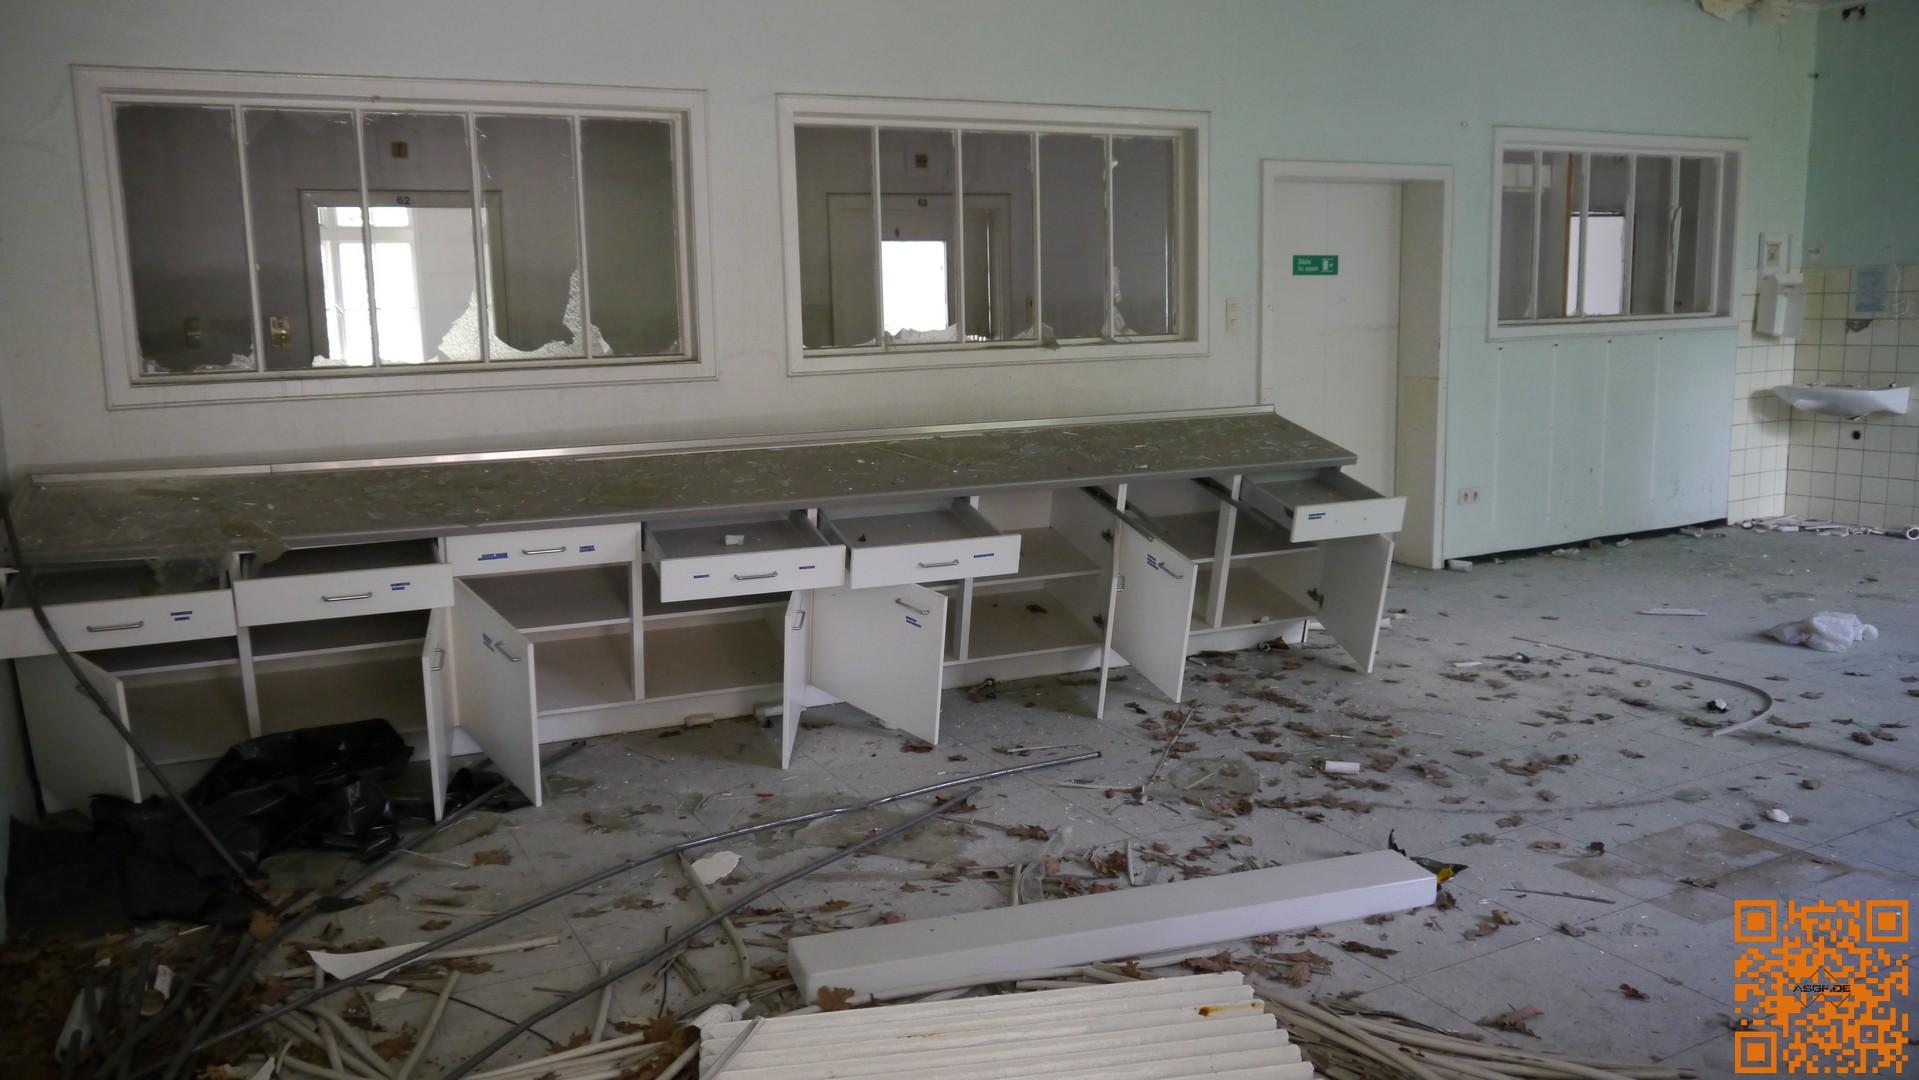 hospital2-17-09-16-40